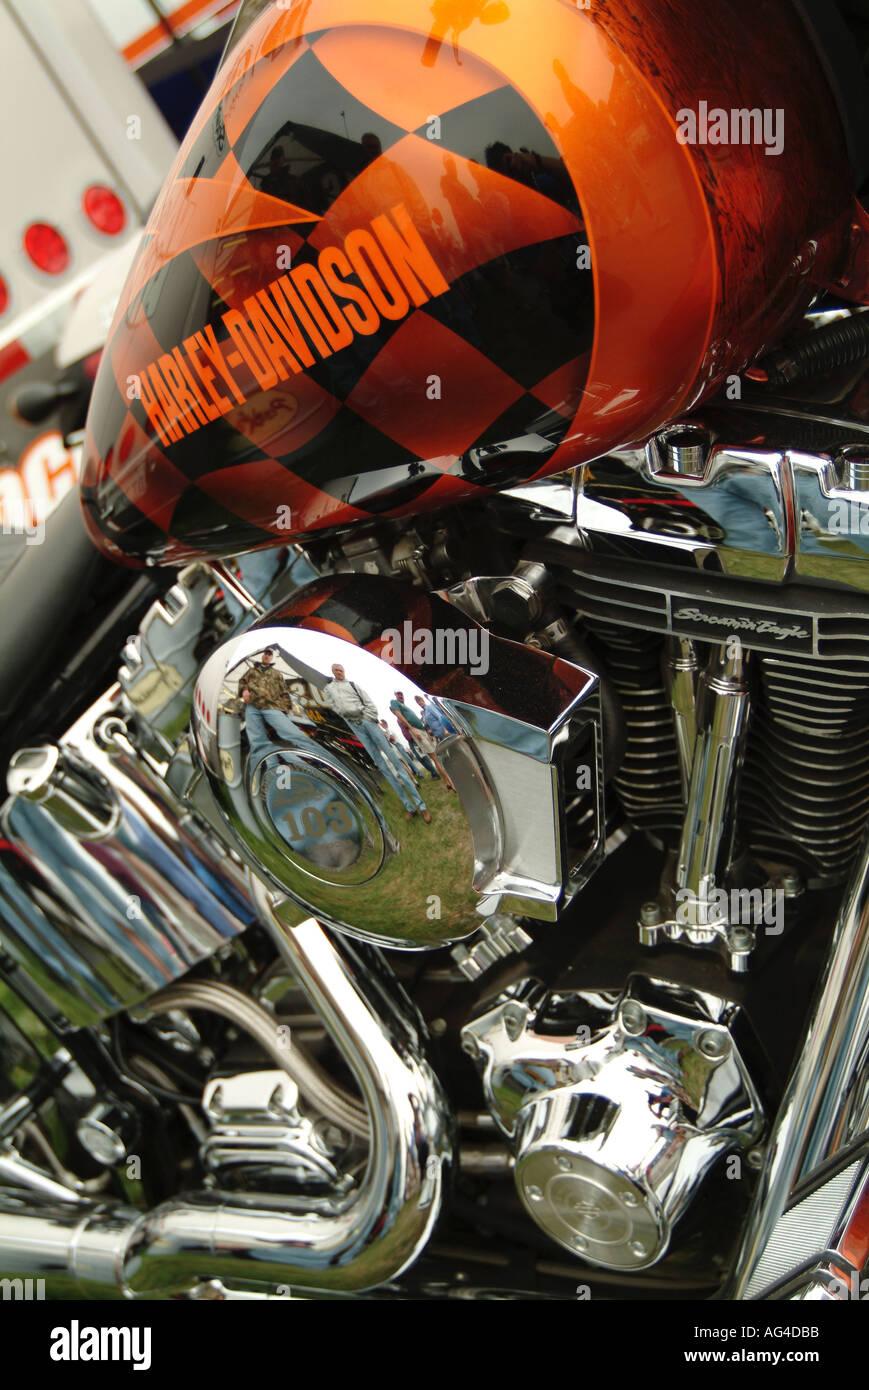 Harley Davidson With Custom Paint Job America Motorcycle Motor Cycle Bike Motorbike V Twin